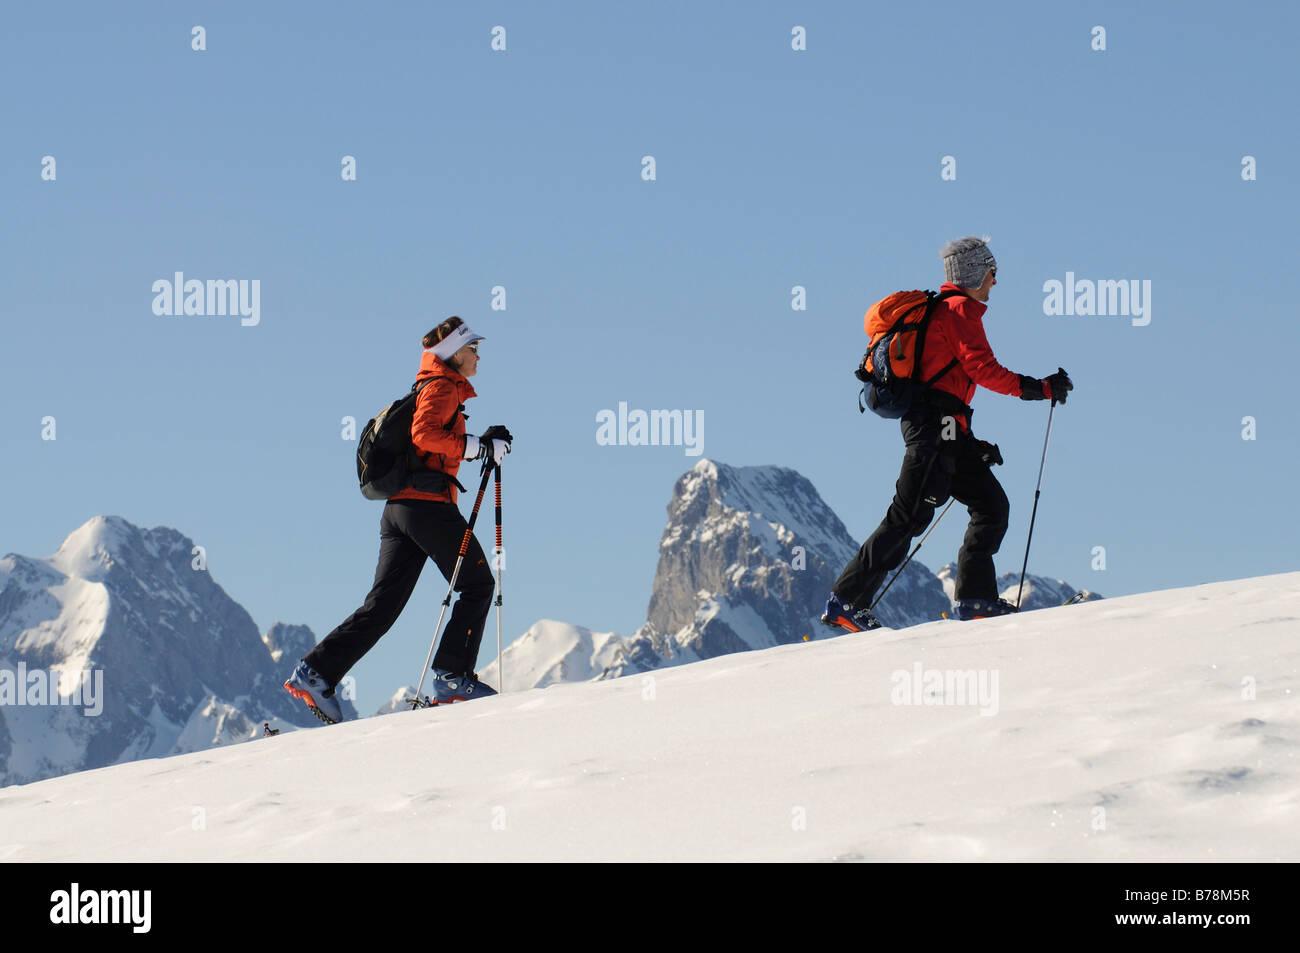 Ski Montagne grimpeurs, Zweisimmen, Rueblihorn, Gummfluh, Gstaad Saanenland, Alpes Bernoises, à l'Ouest, Photo Stock